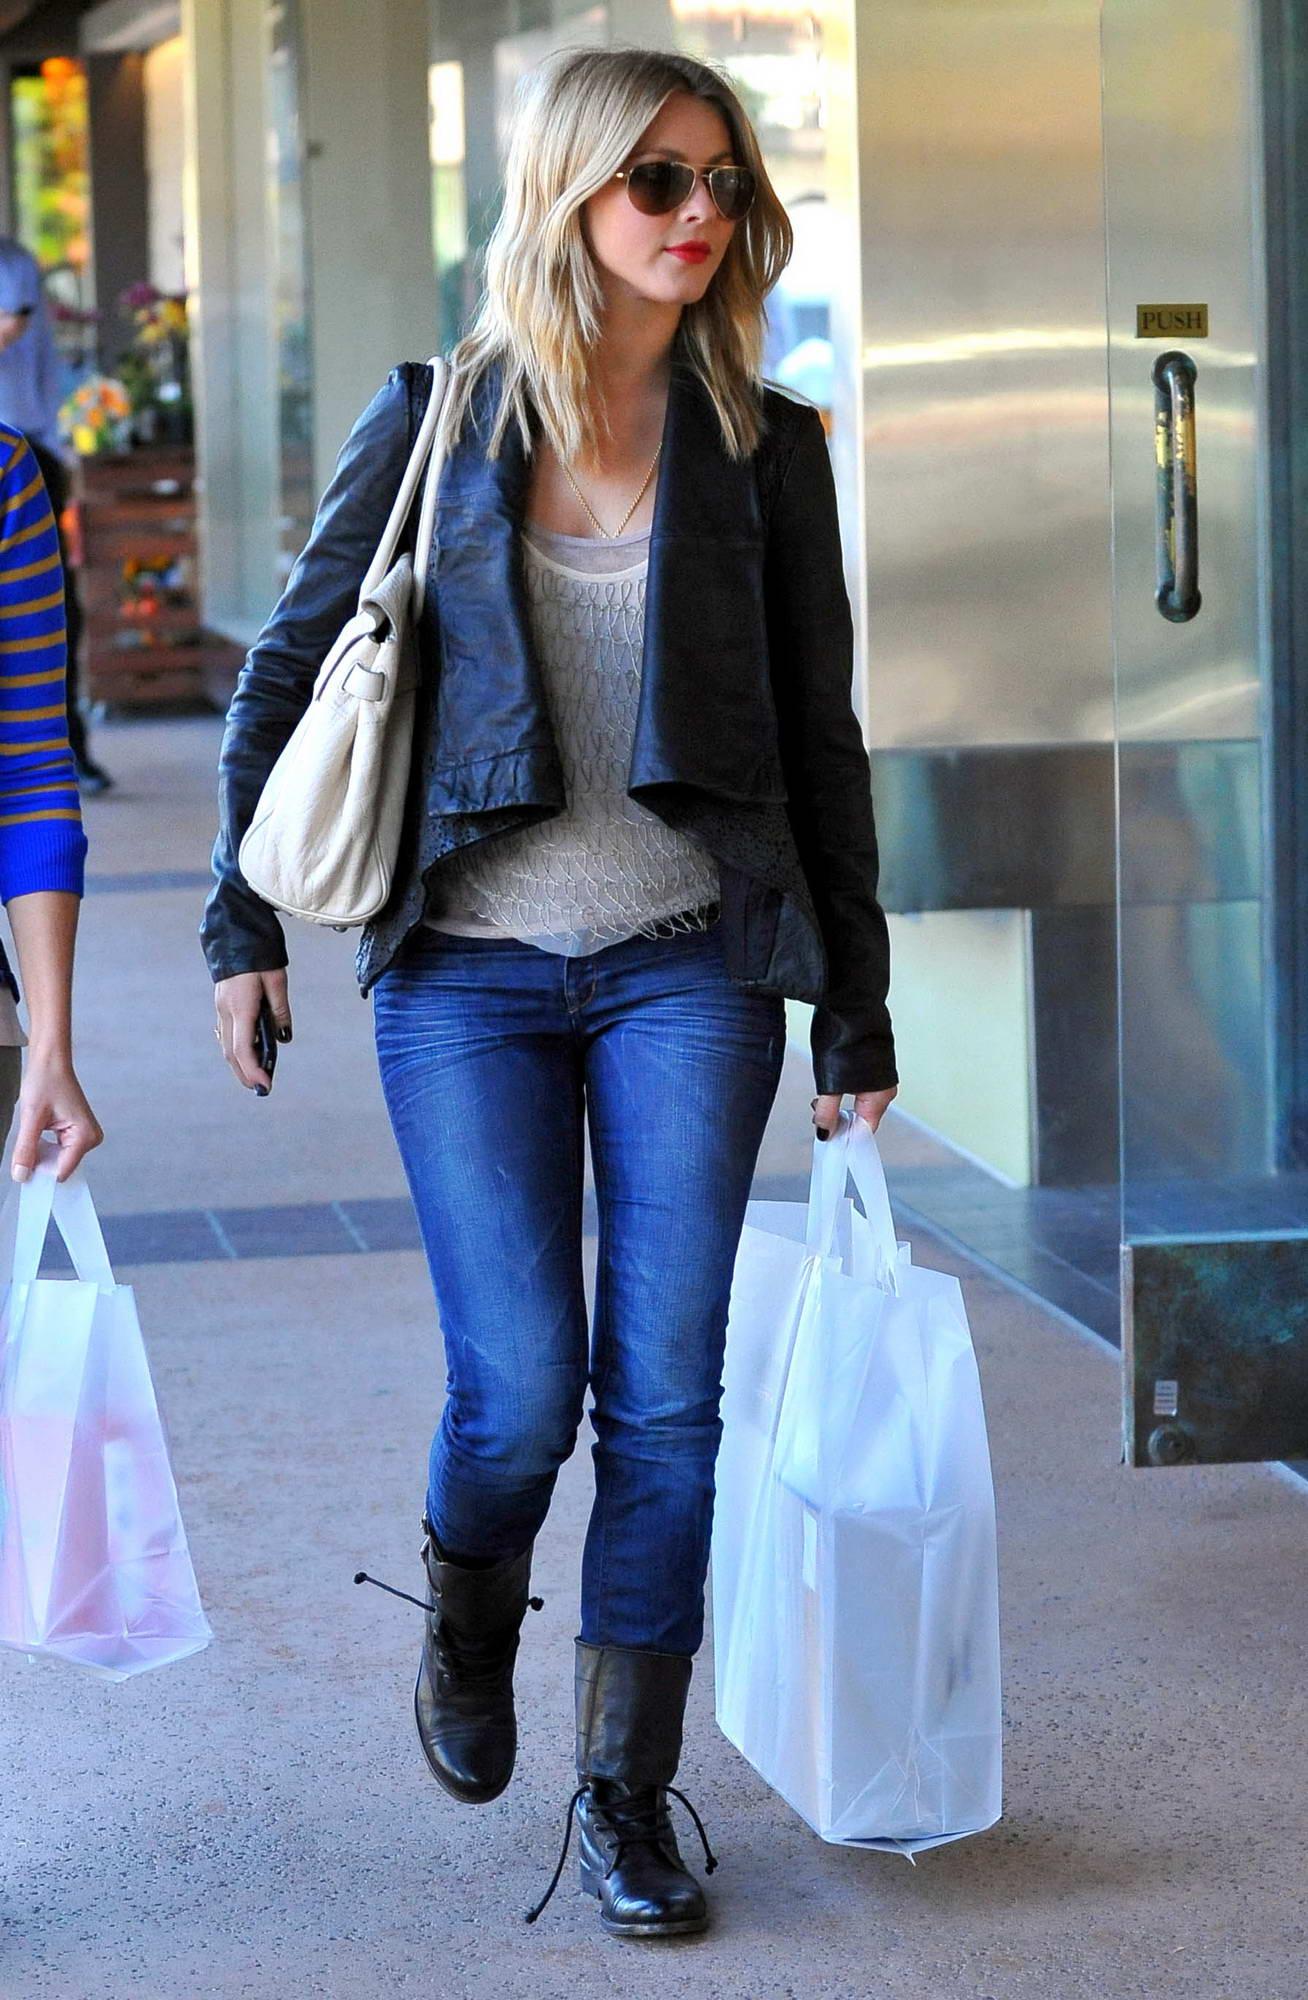 Julianne Hough Shopping Candids At Brentwood HawtCelebs